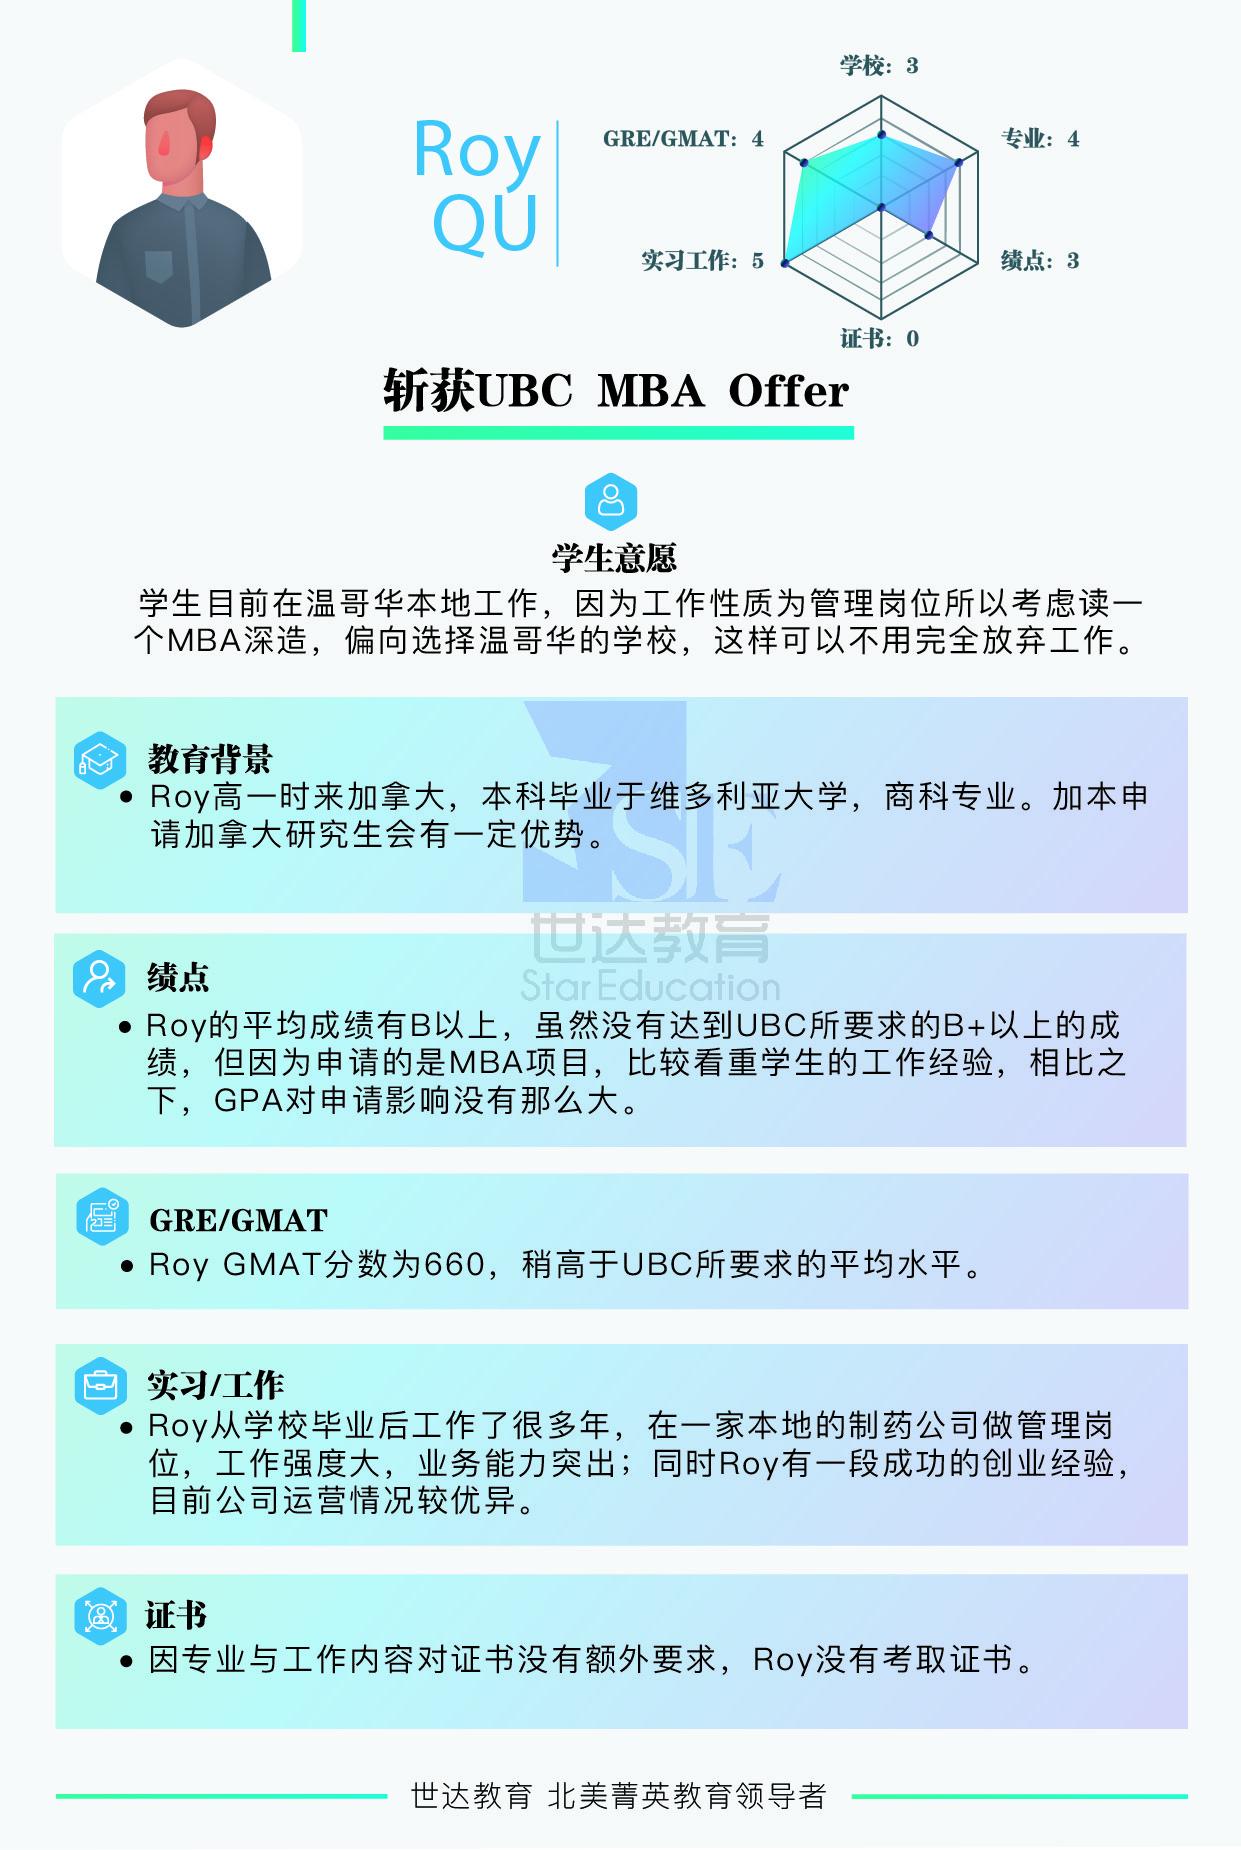 UBC研究生申请案例- UBC MBA Offer